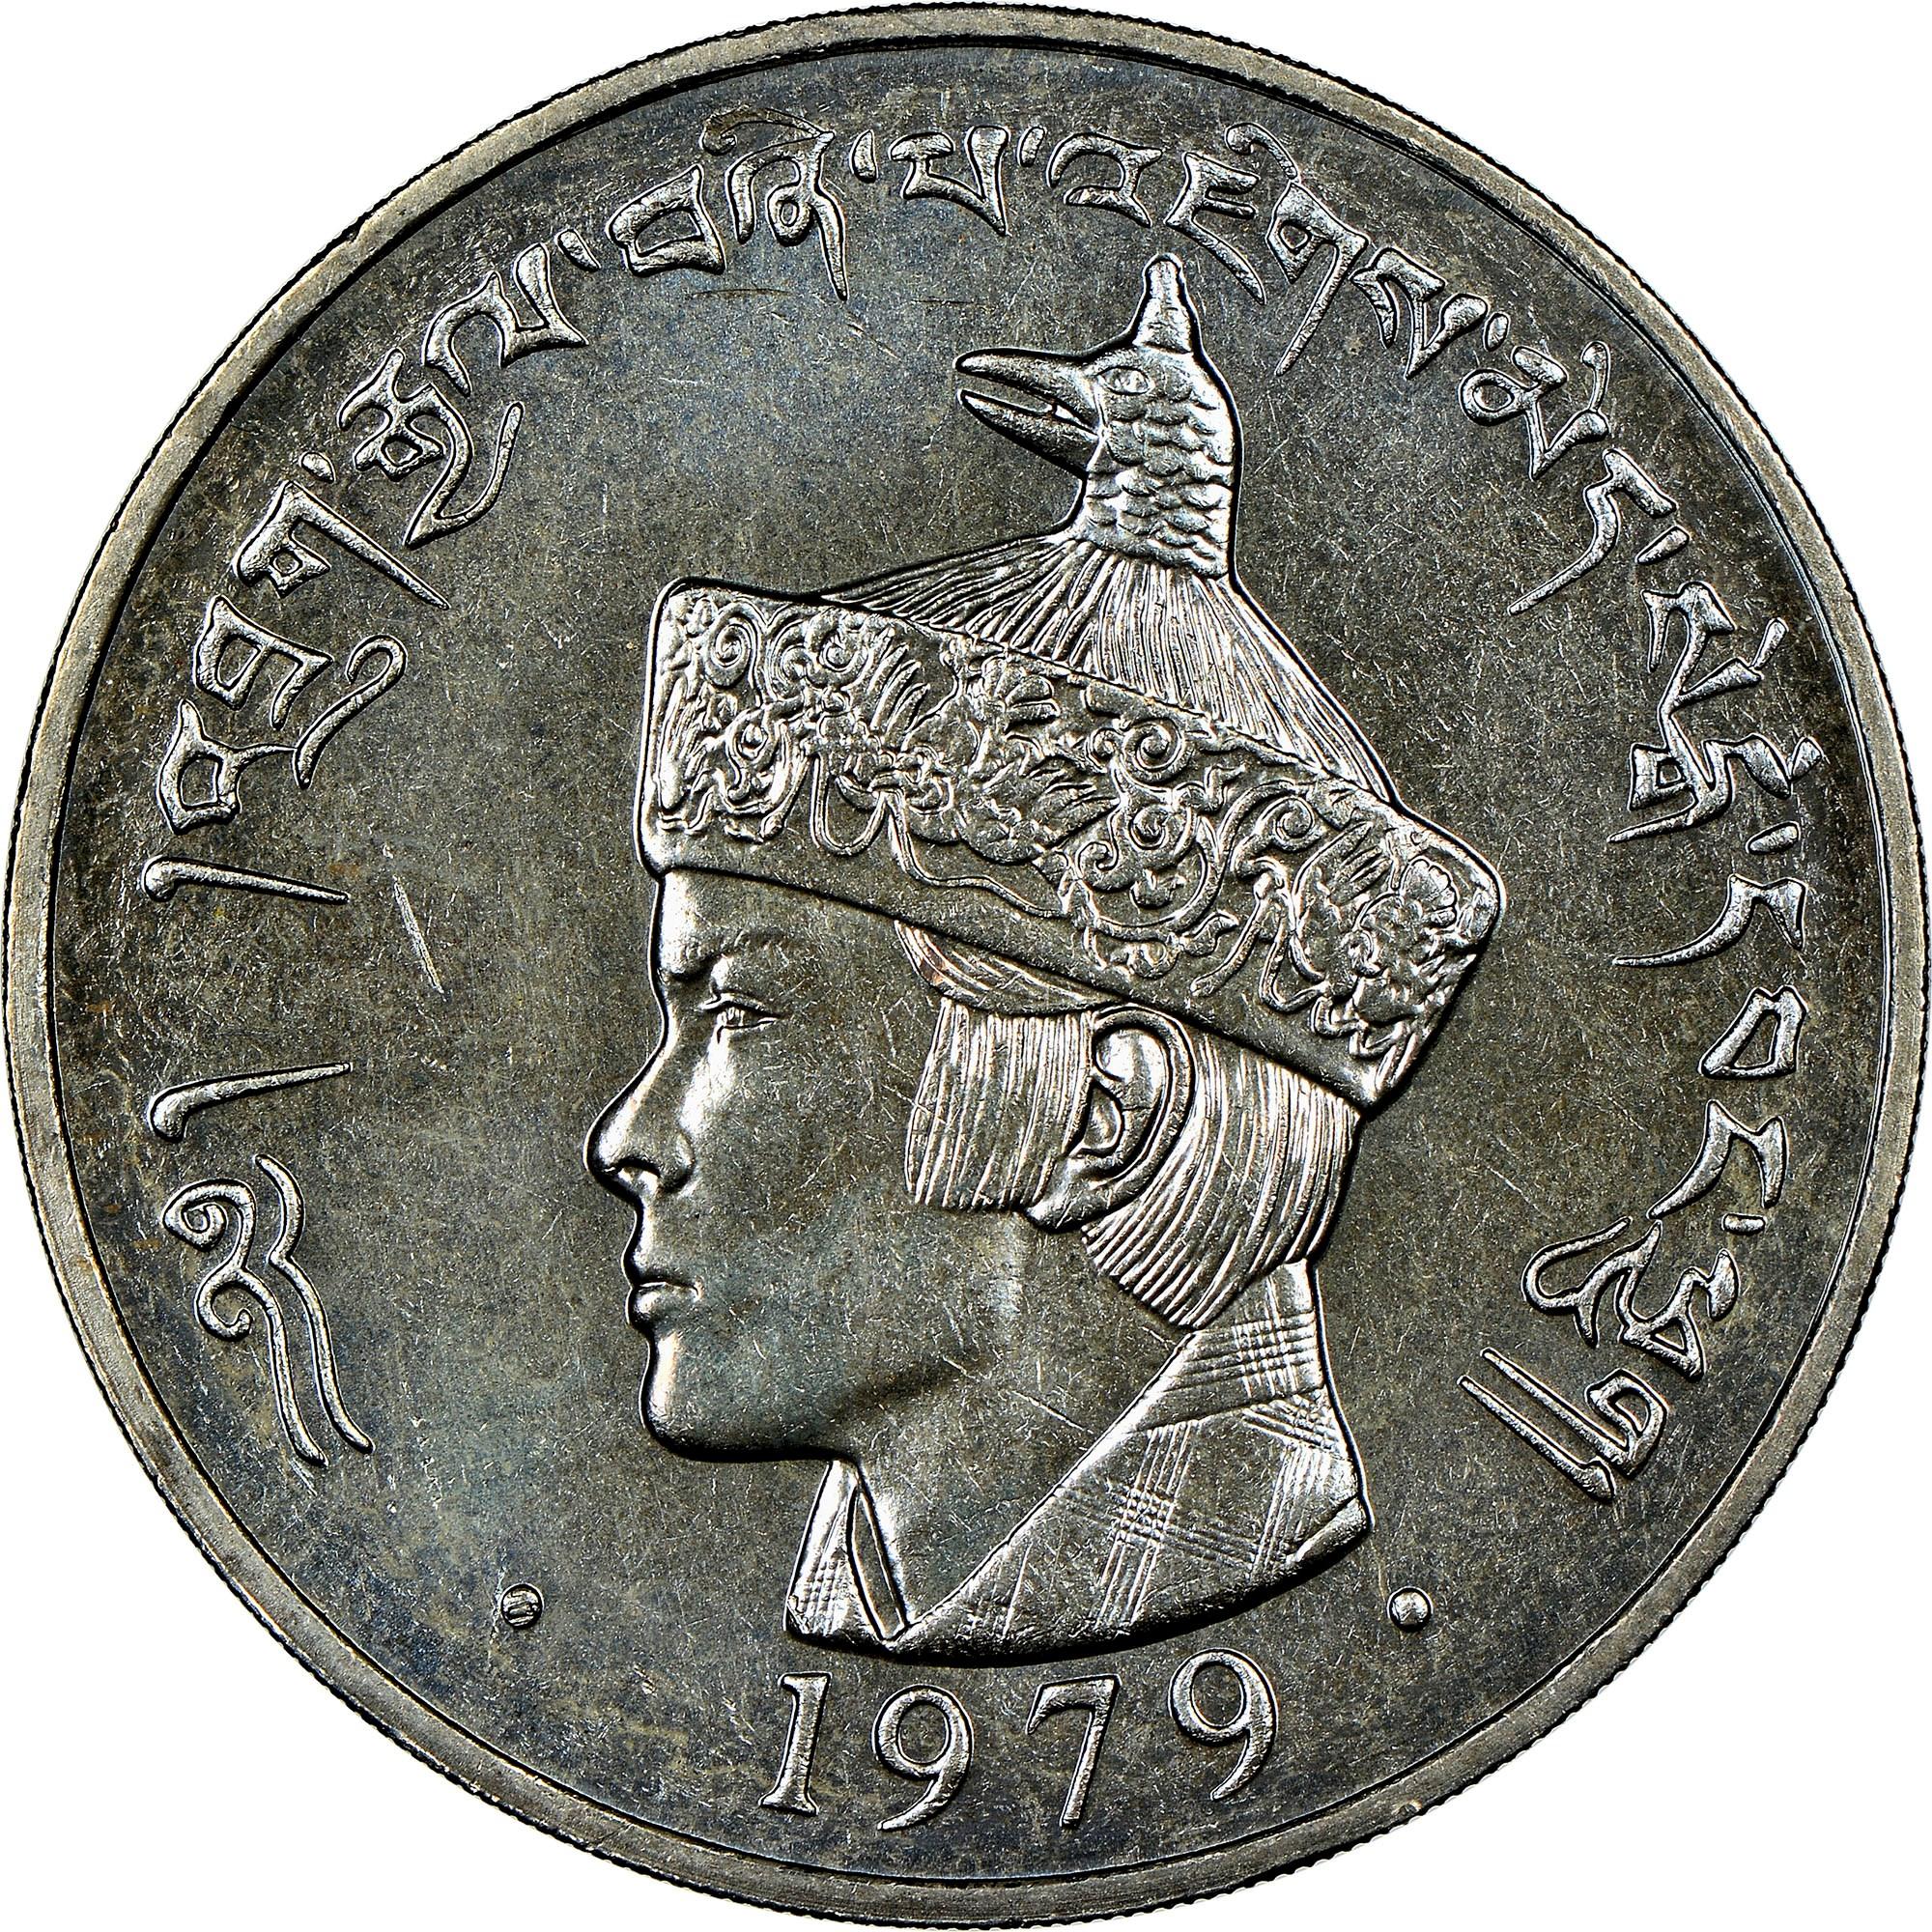 Bhutan 3 Ngultrums obverse